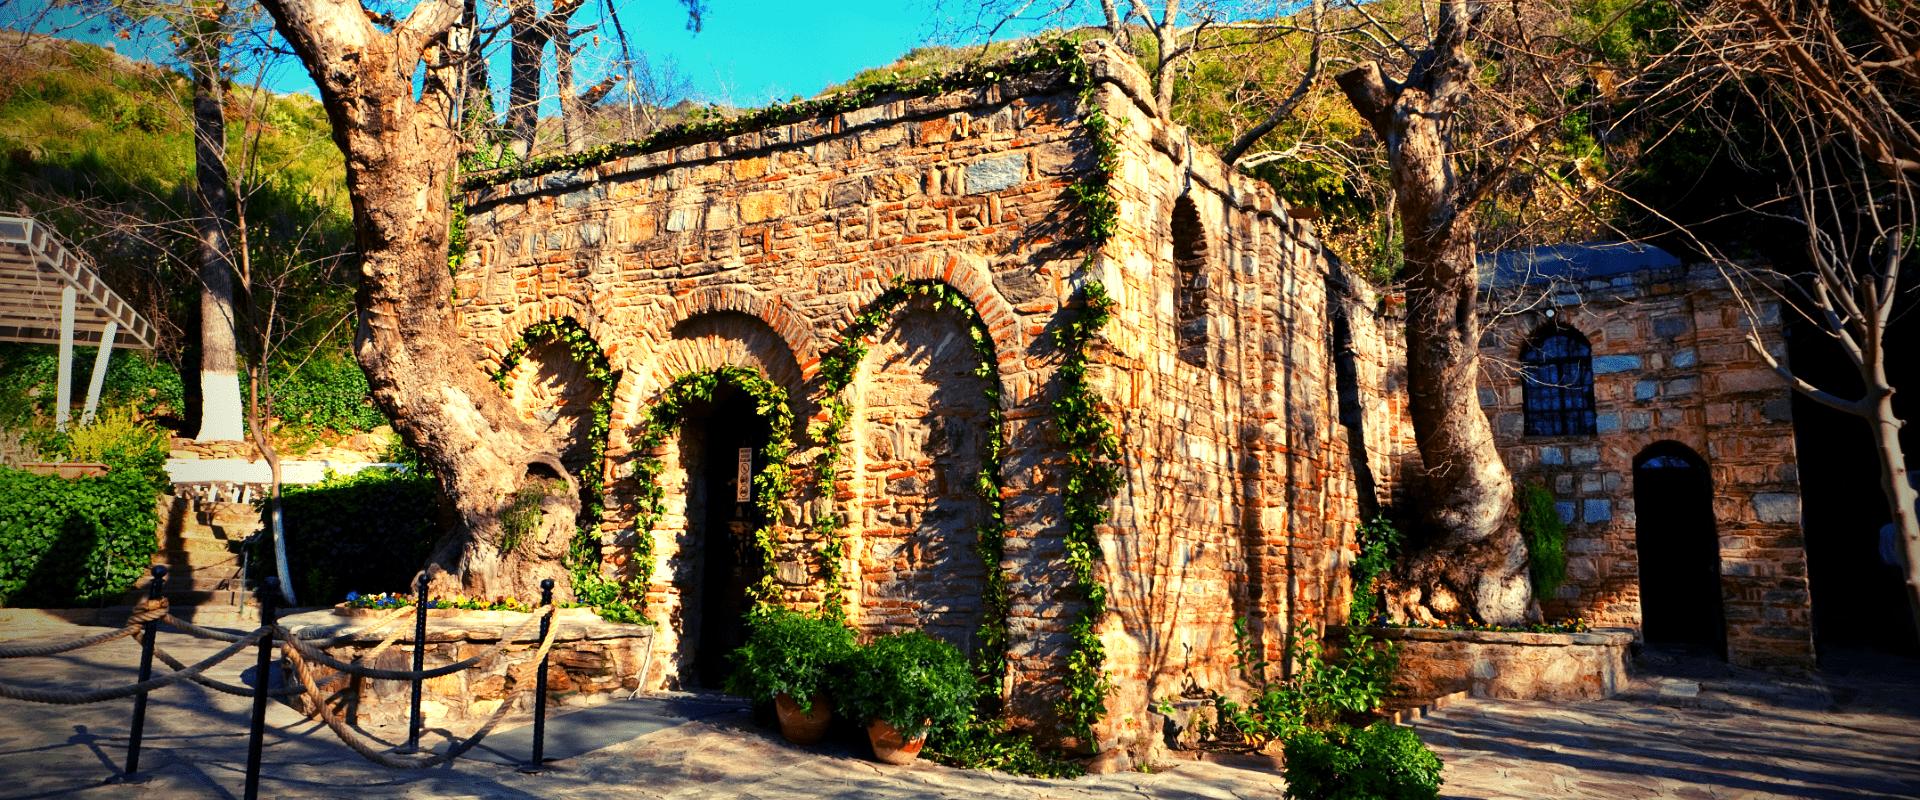 Seven Churches, Holy Land, Rome Tour, Turkey